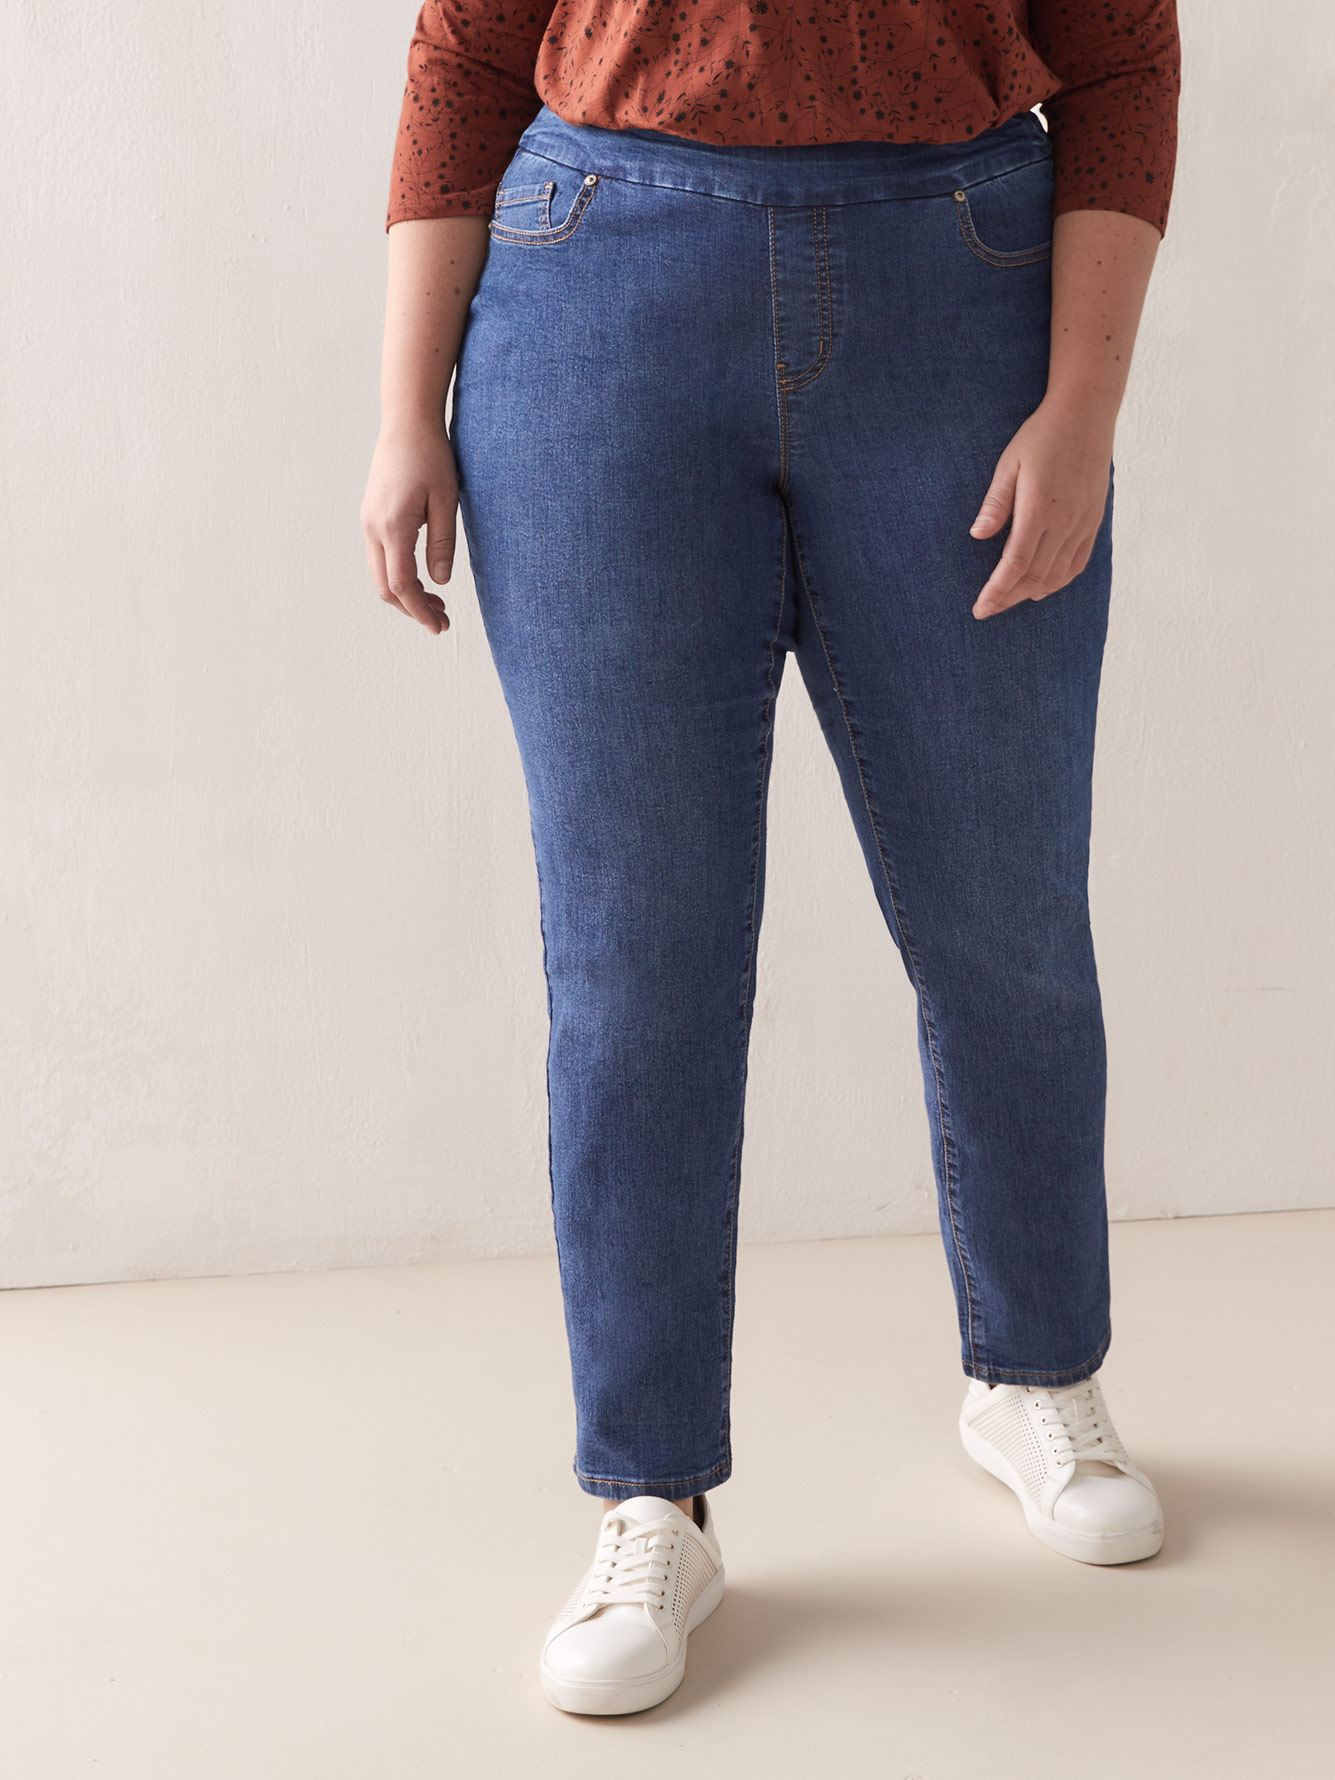 Universal Fit, Petite, Straight Leg Jean - d/C JEANS